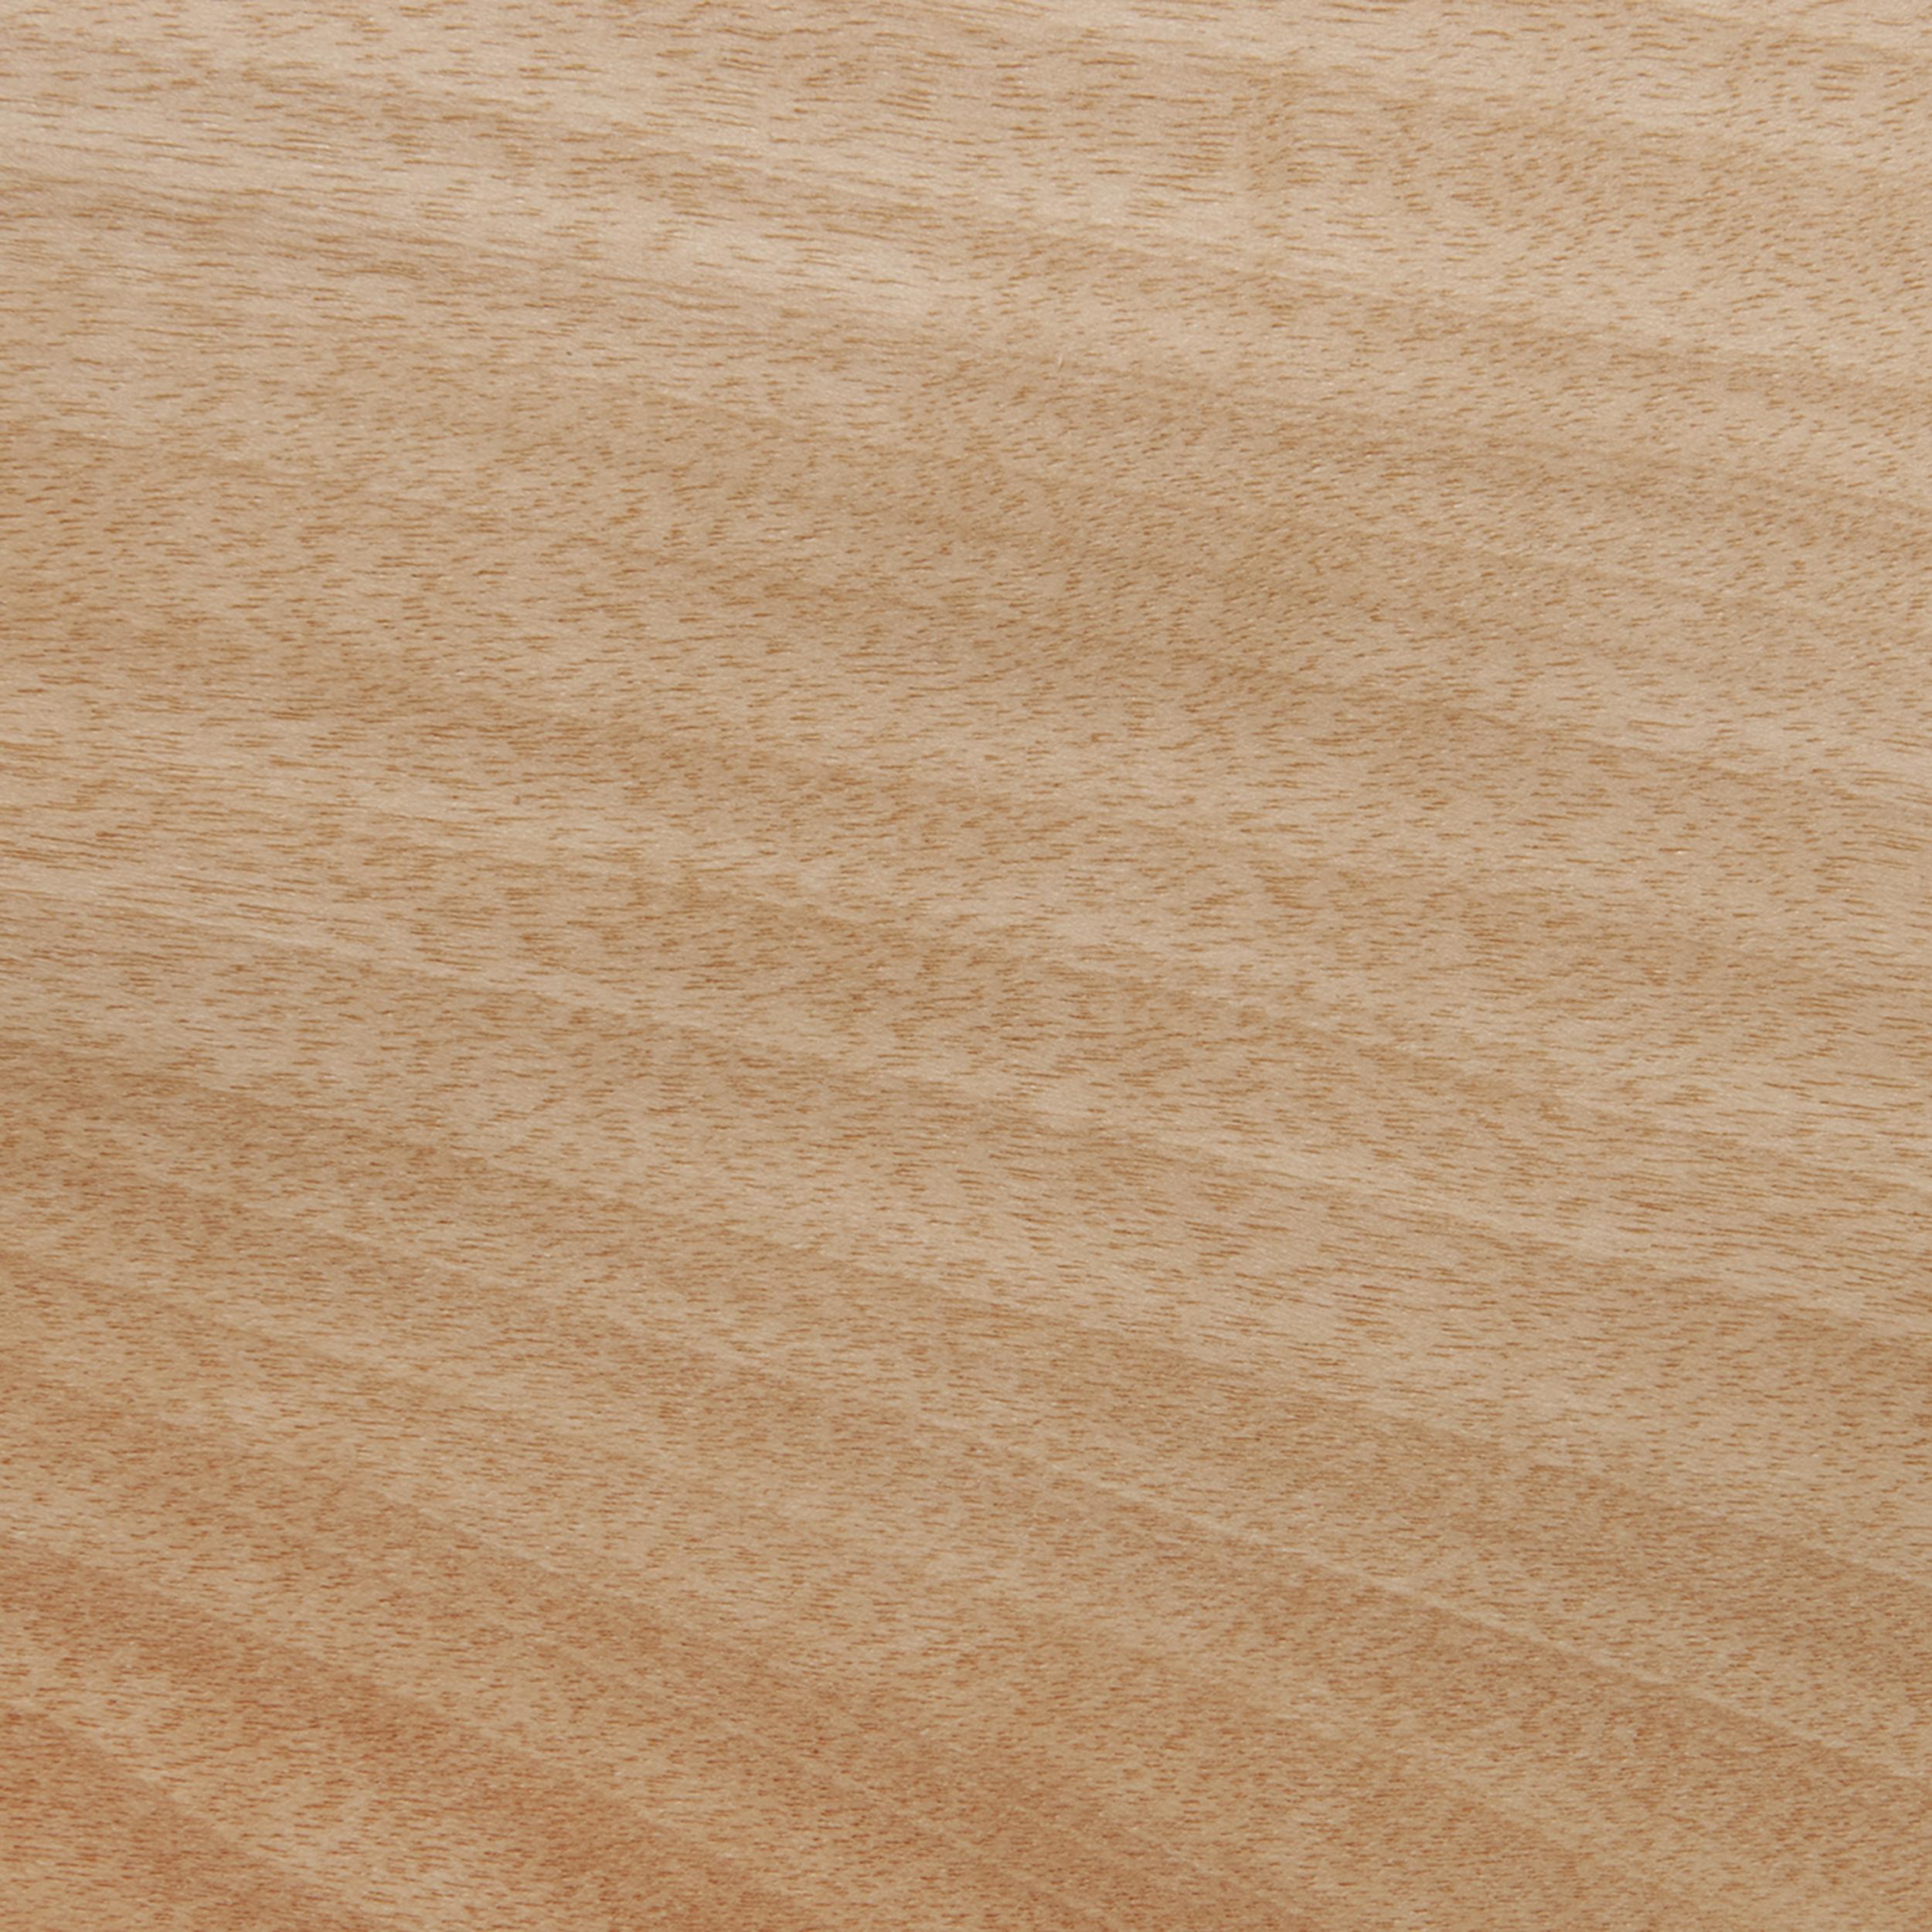 Anigre, Flat Cut 4'X8' Veneer Sheet, 10MIL Paper Backed